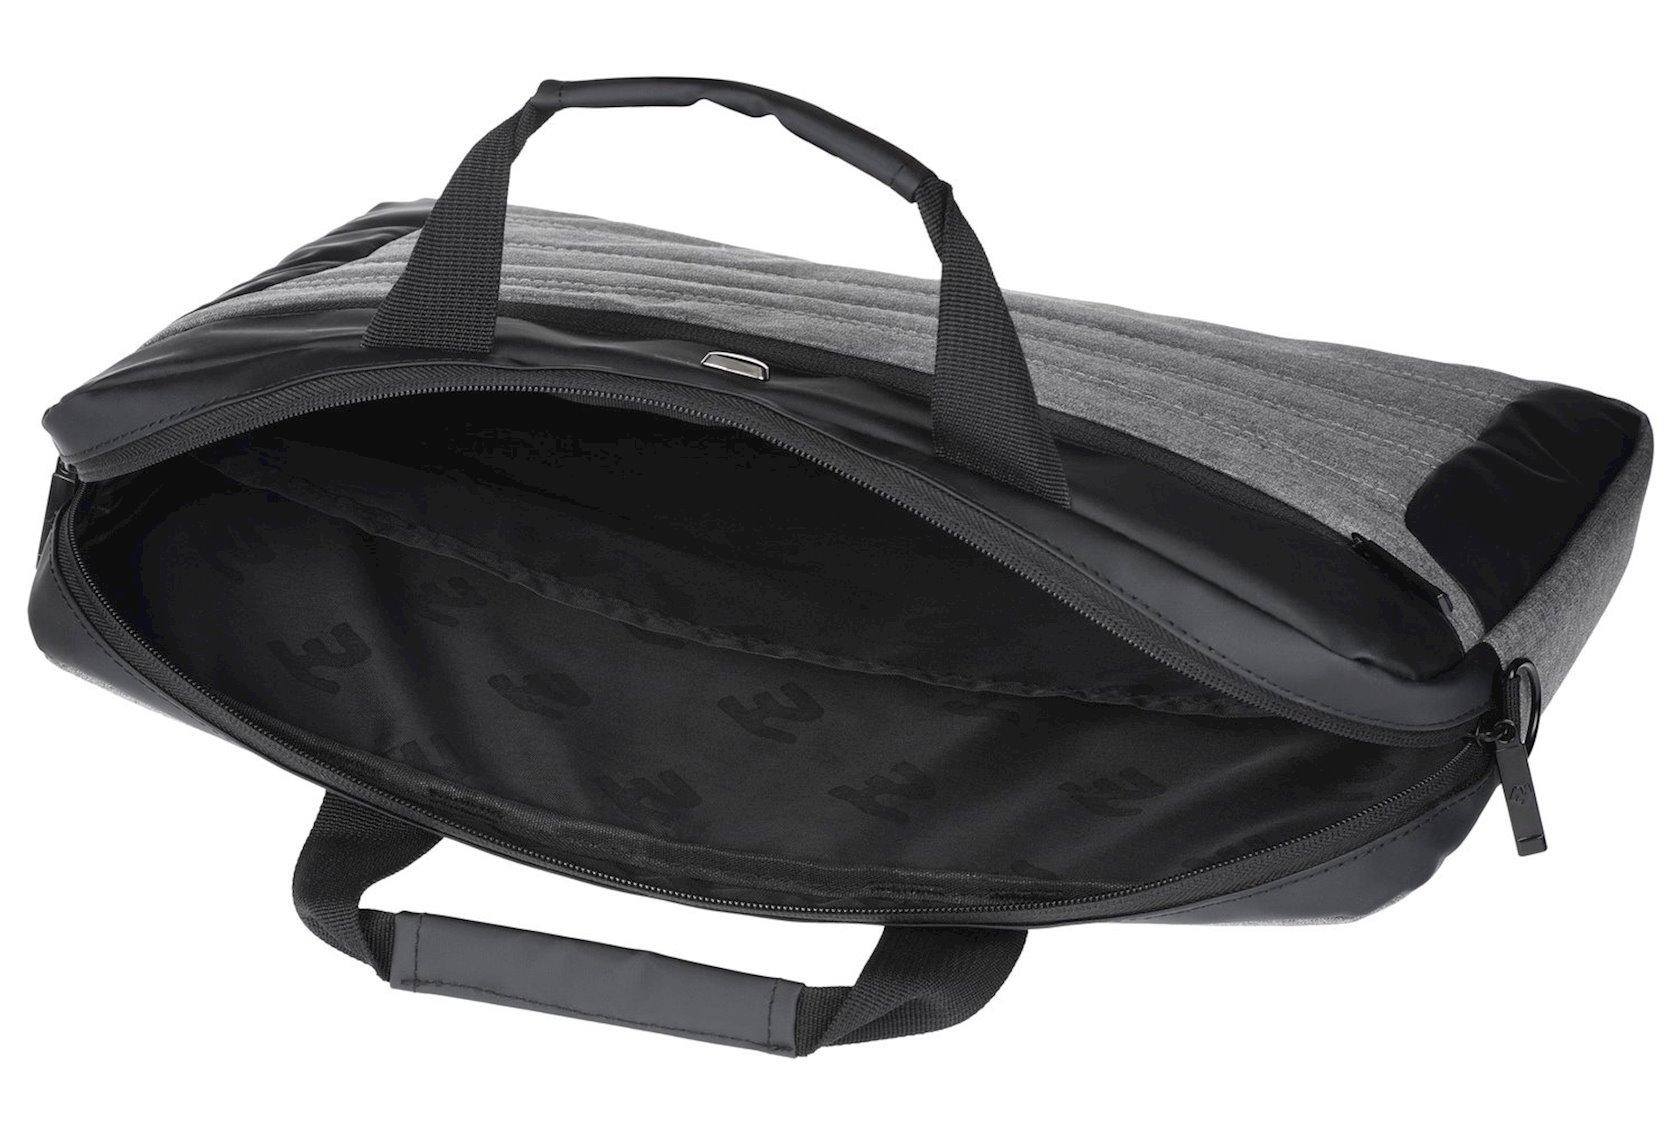 Çanta noutbuk üçün 2E Laptop Bag 16 2E-CBN816GR, grey/black